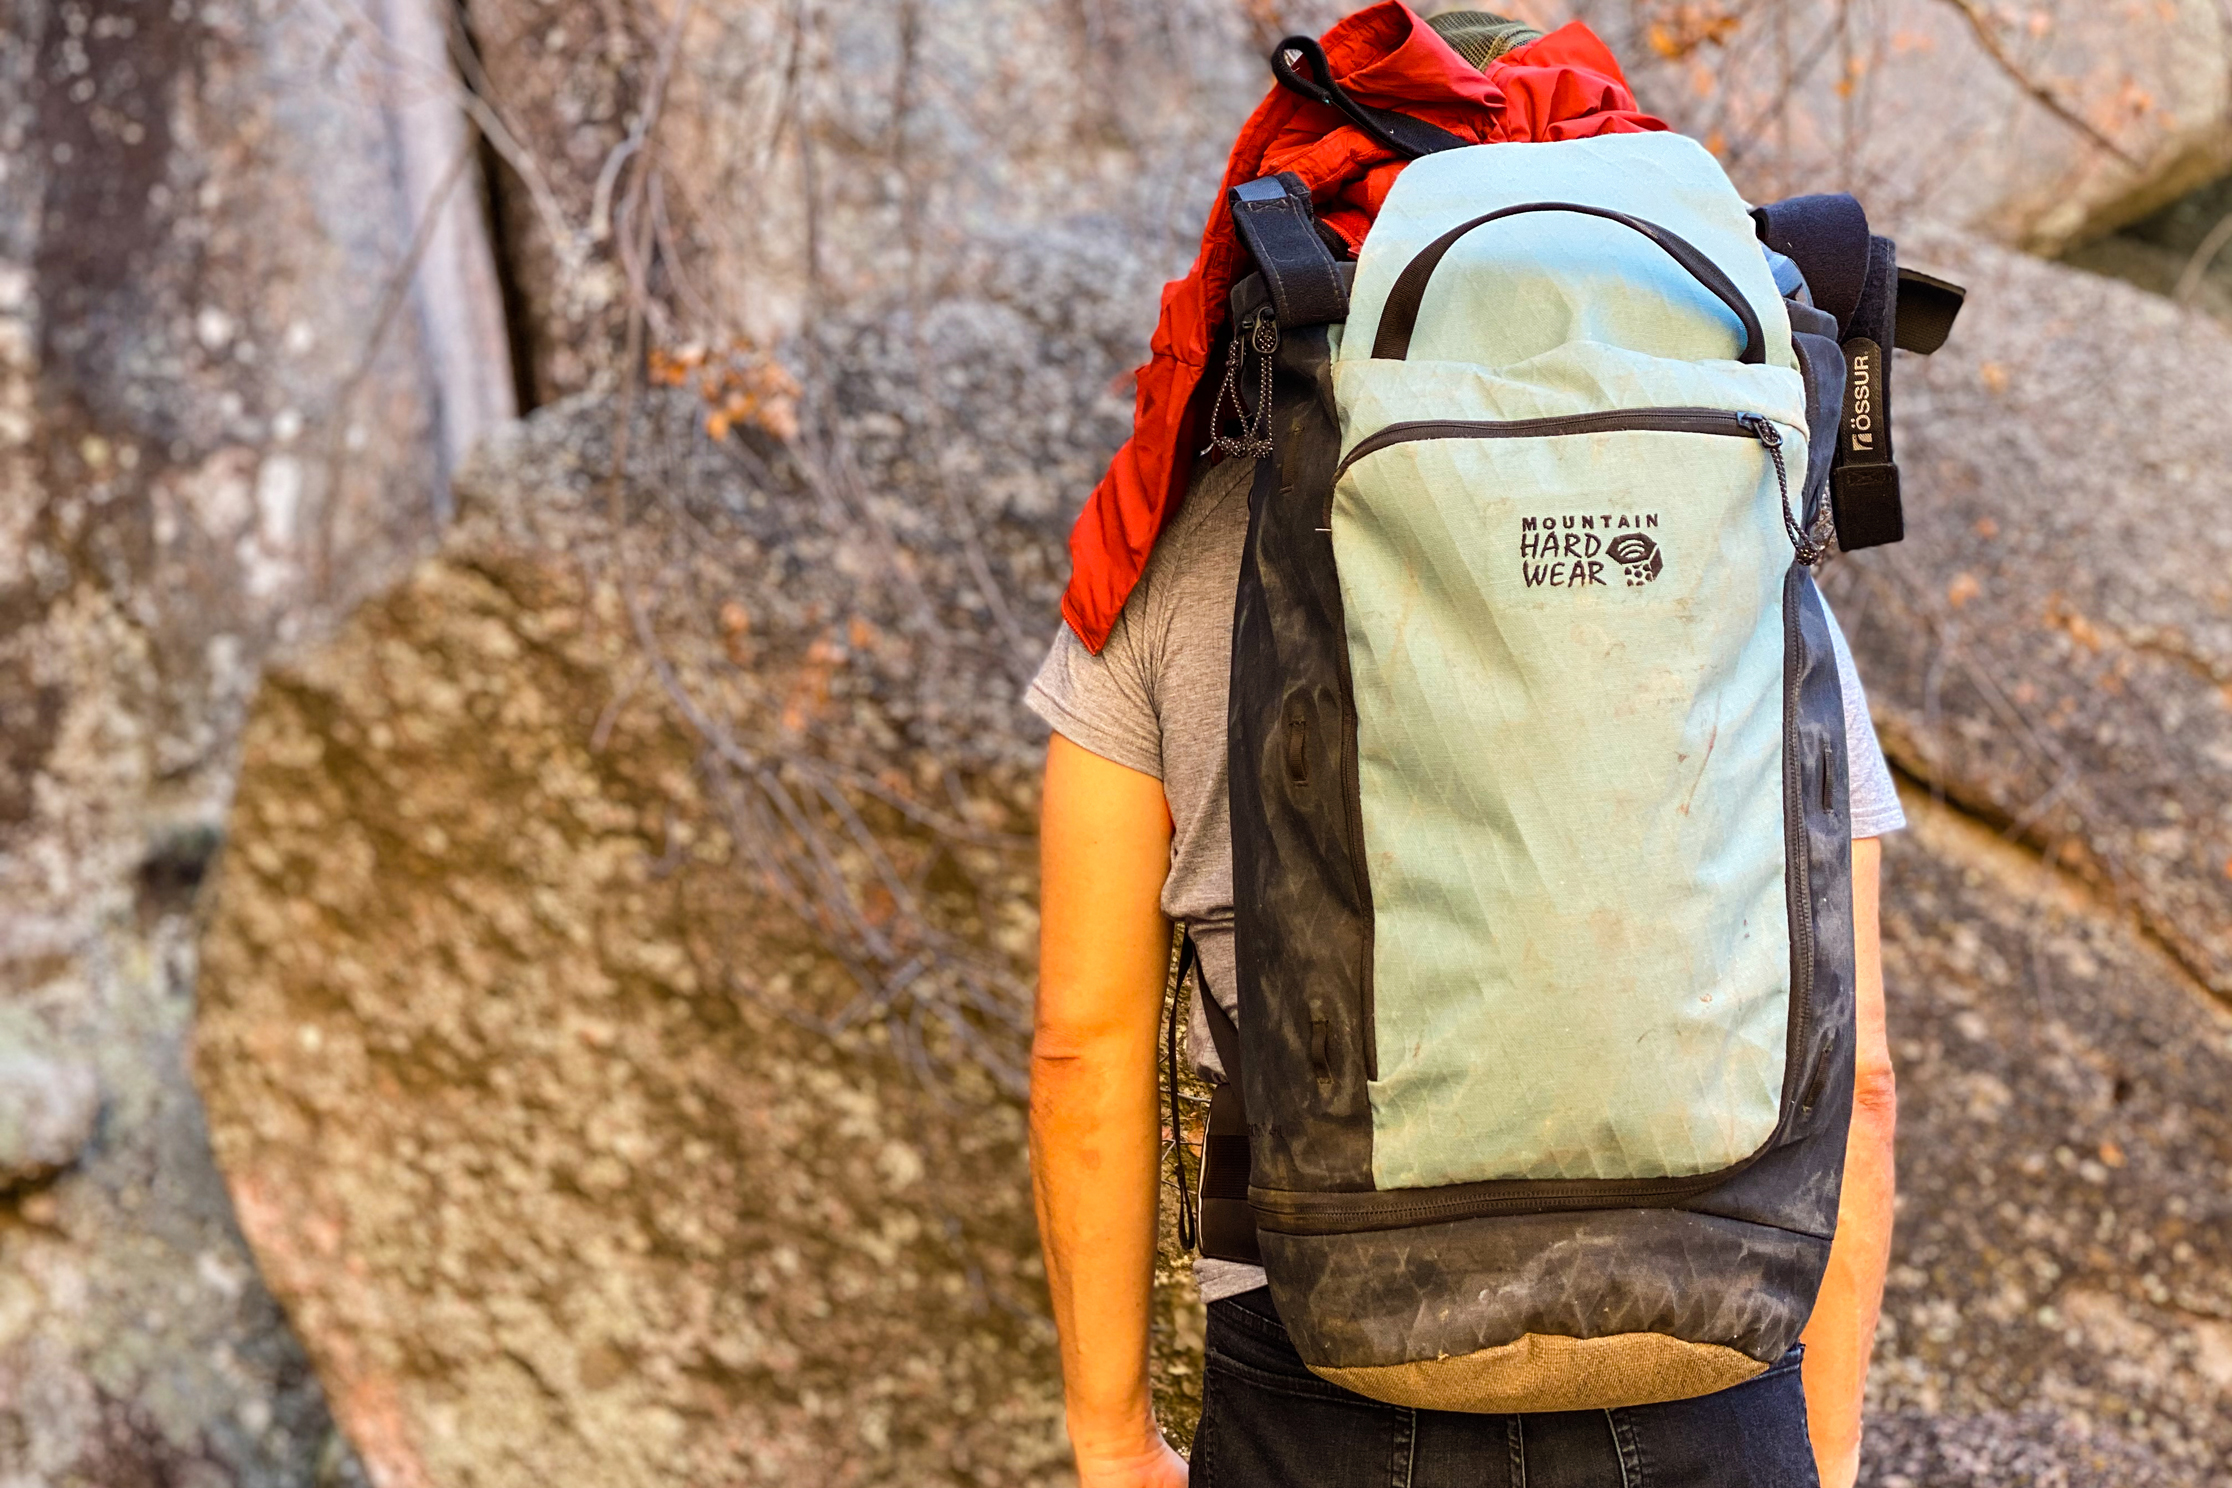 Mountain Hardwear Crag Wagon 45 climbing pack